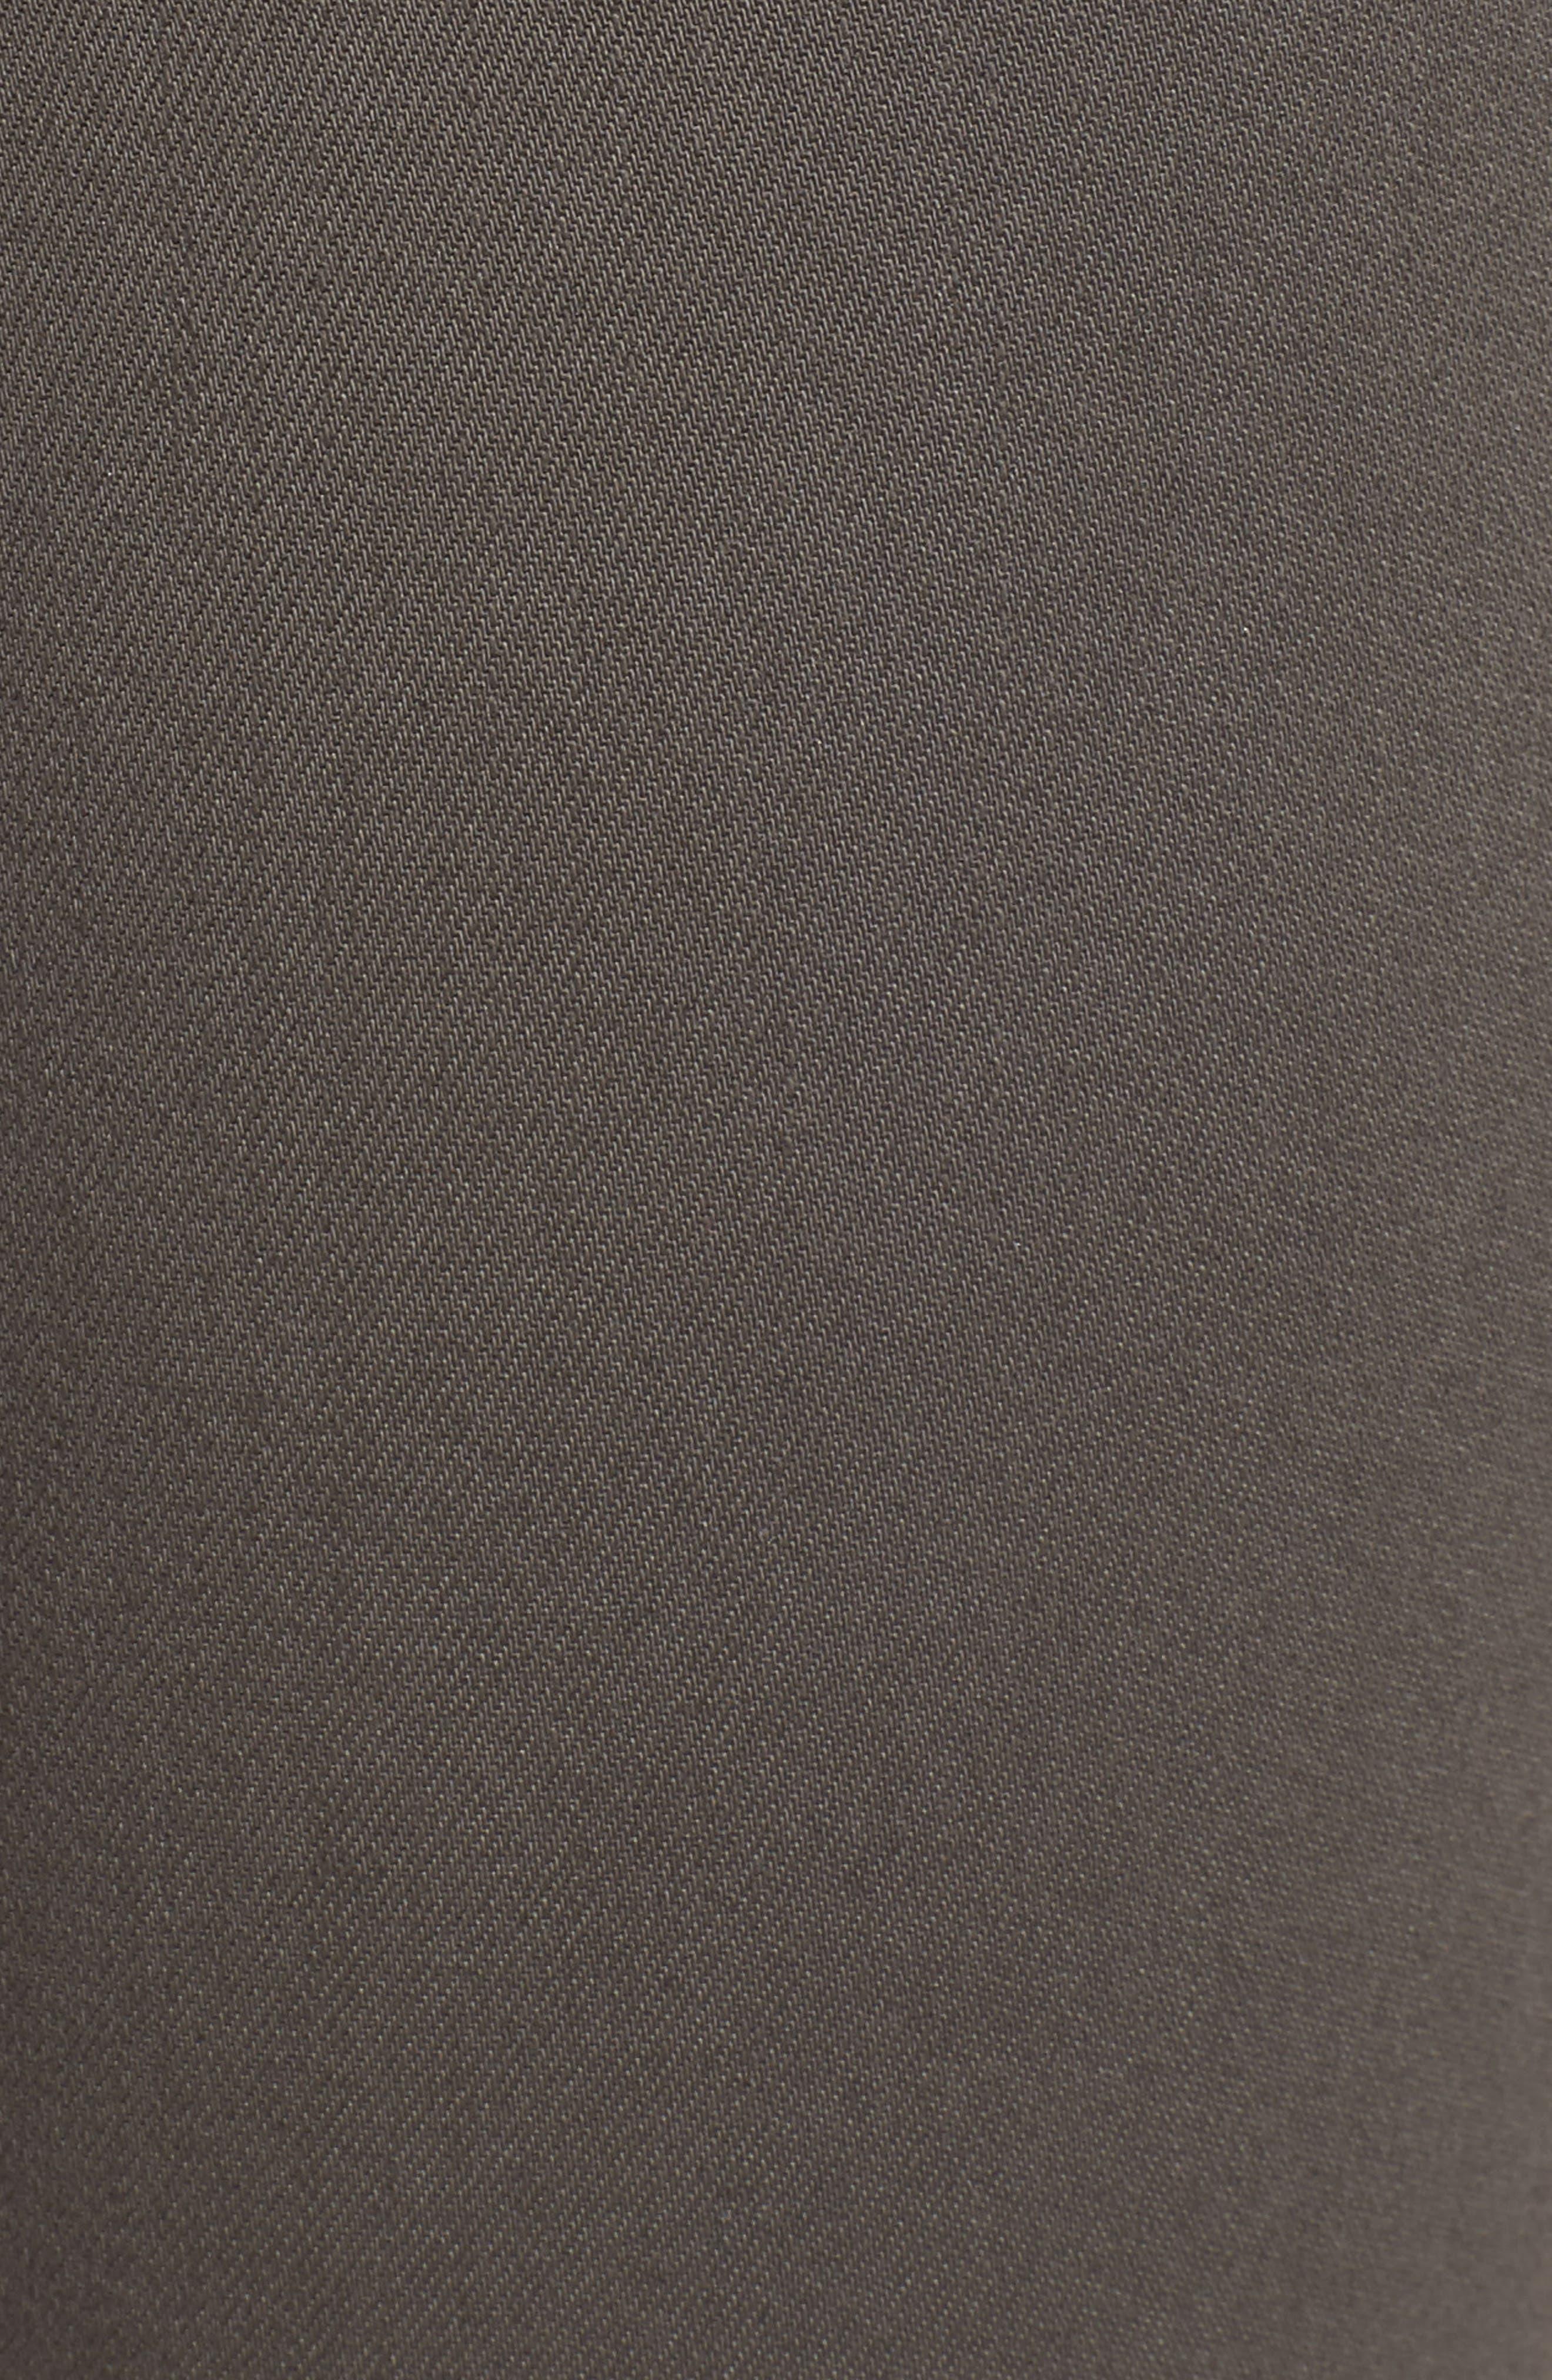 Alana High Waist Crop Skinny Jeans,                             Alternate thumbnail 6, color,                             COATED JUNIPER